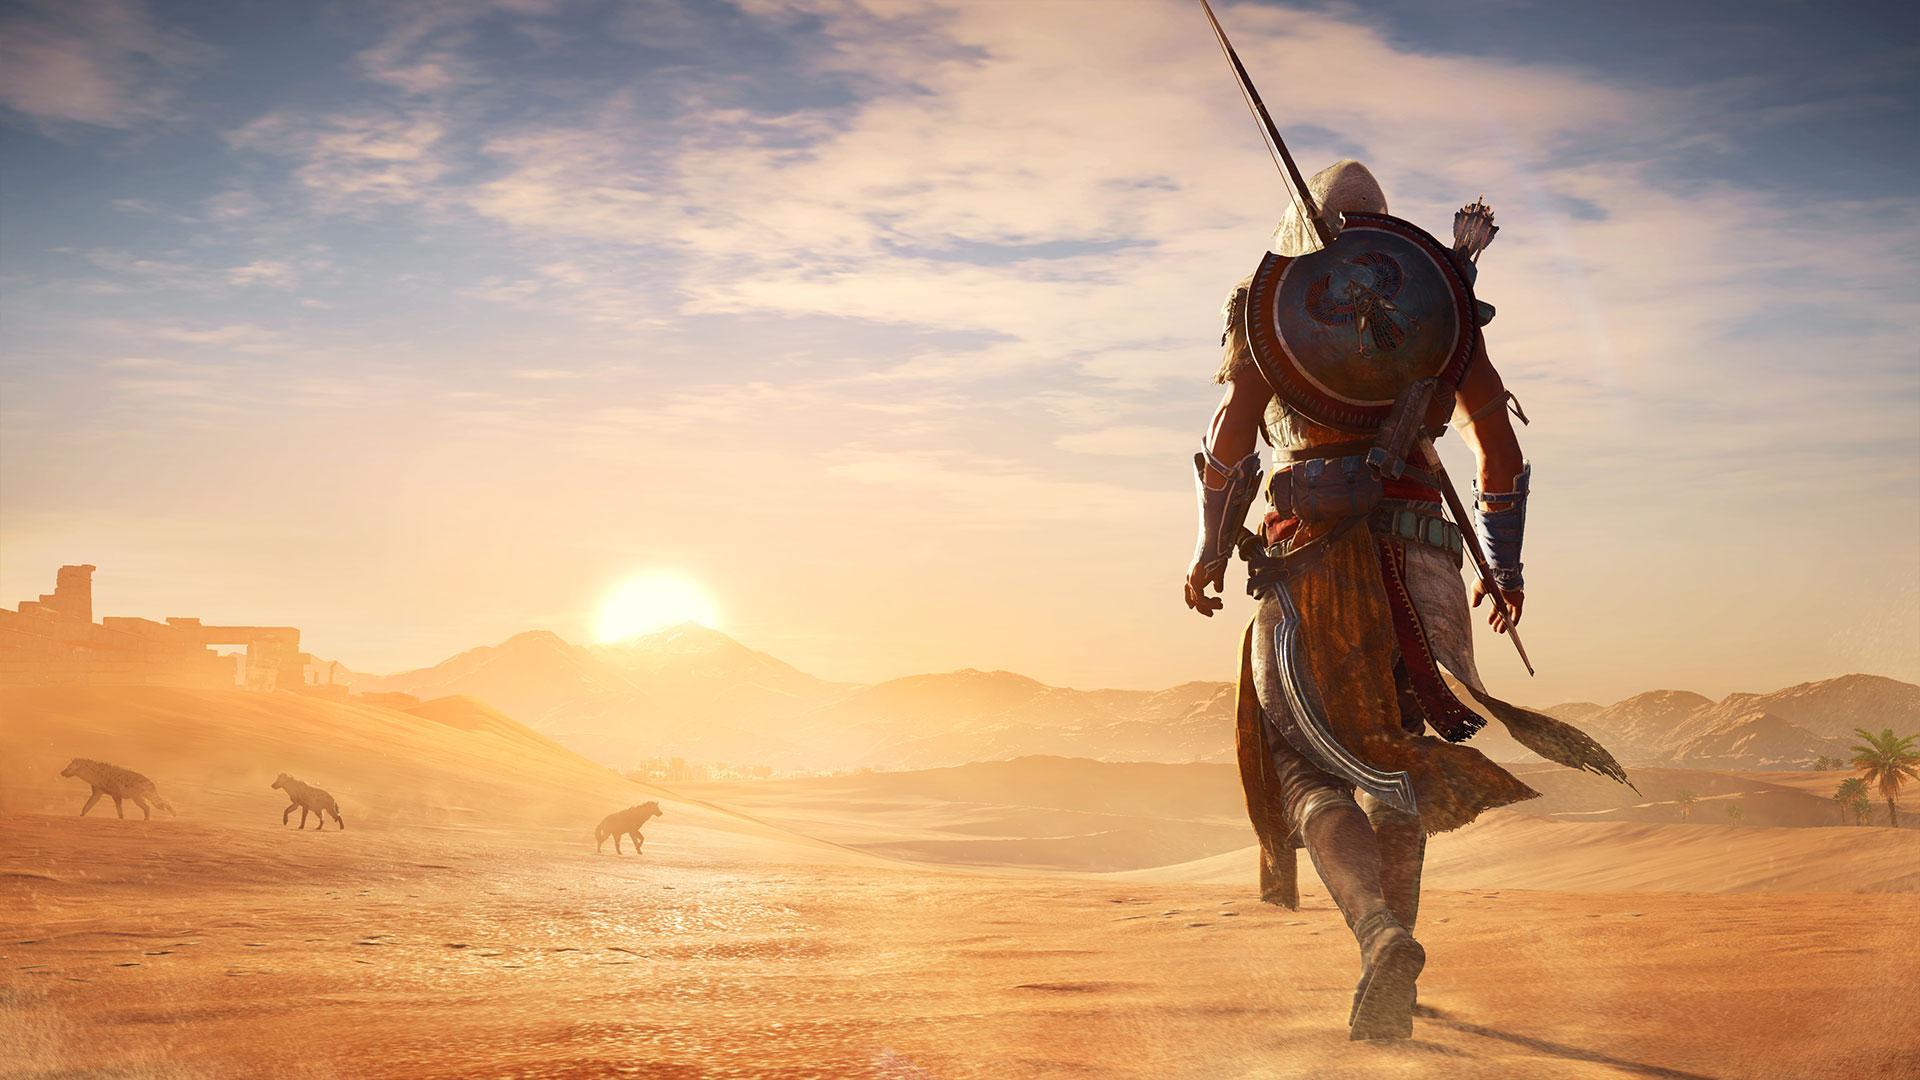 Assassin's Creed: Origins está plagado de notas positivas falsas en Metacritic